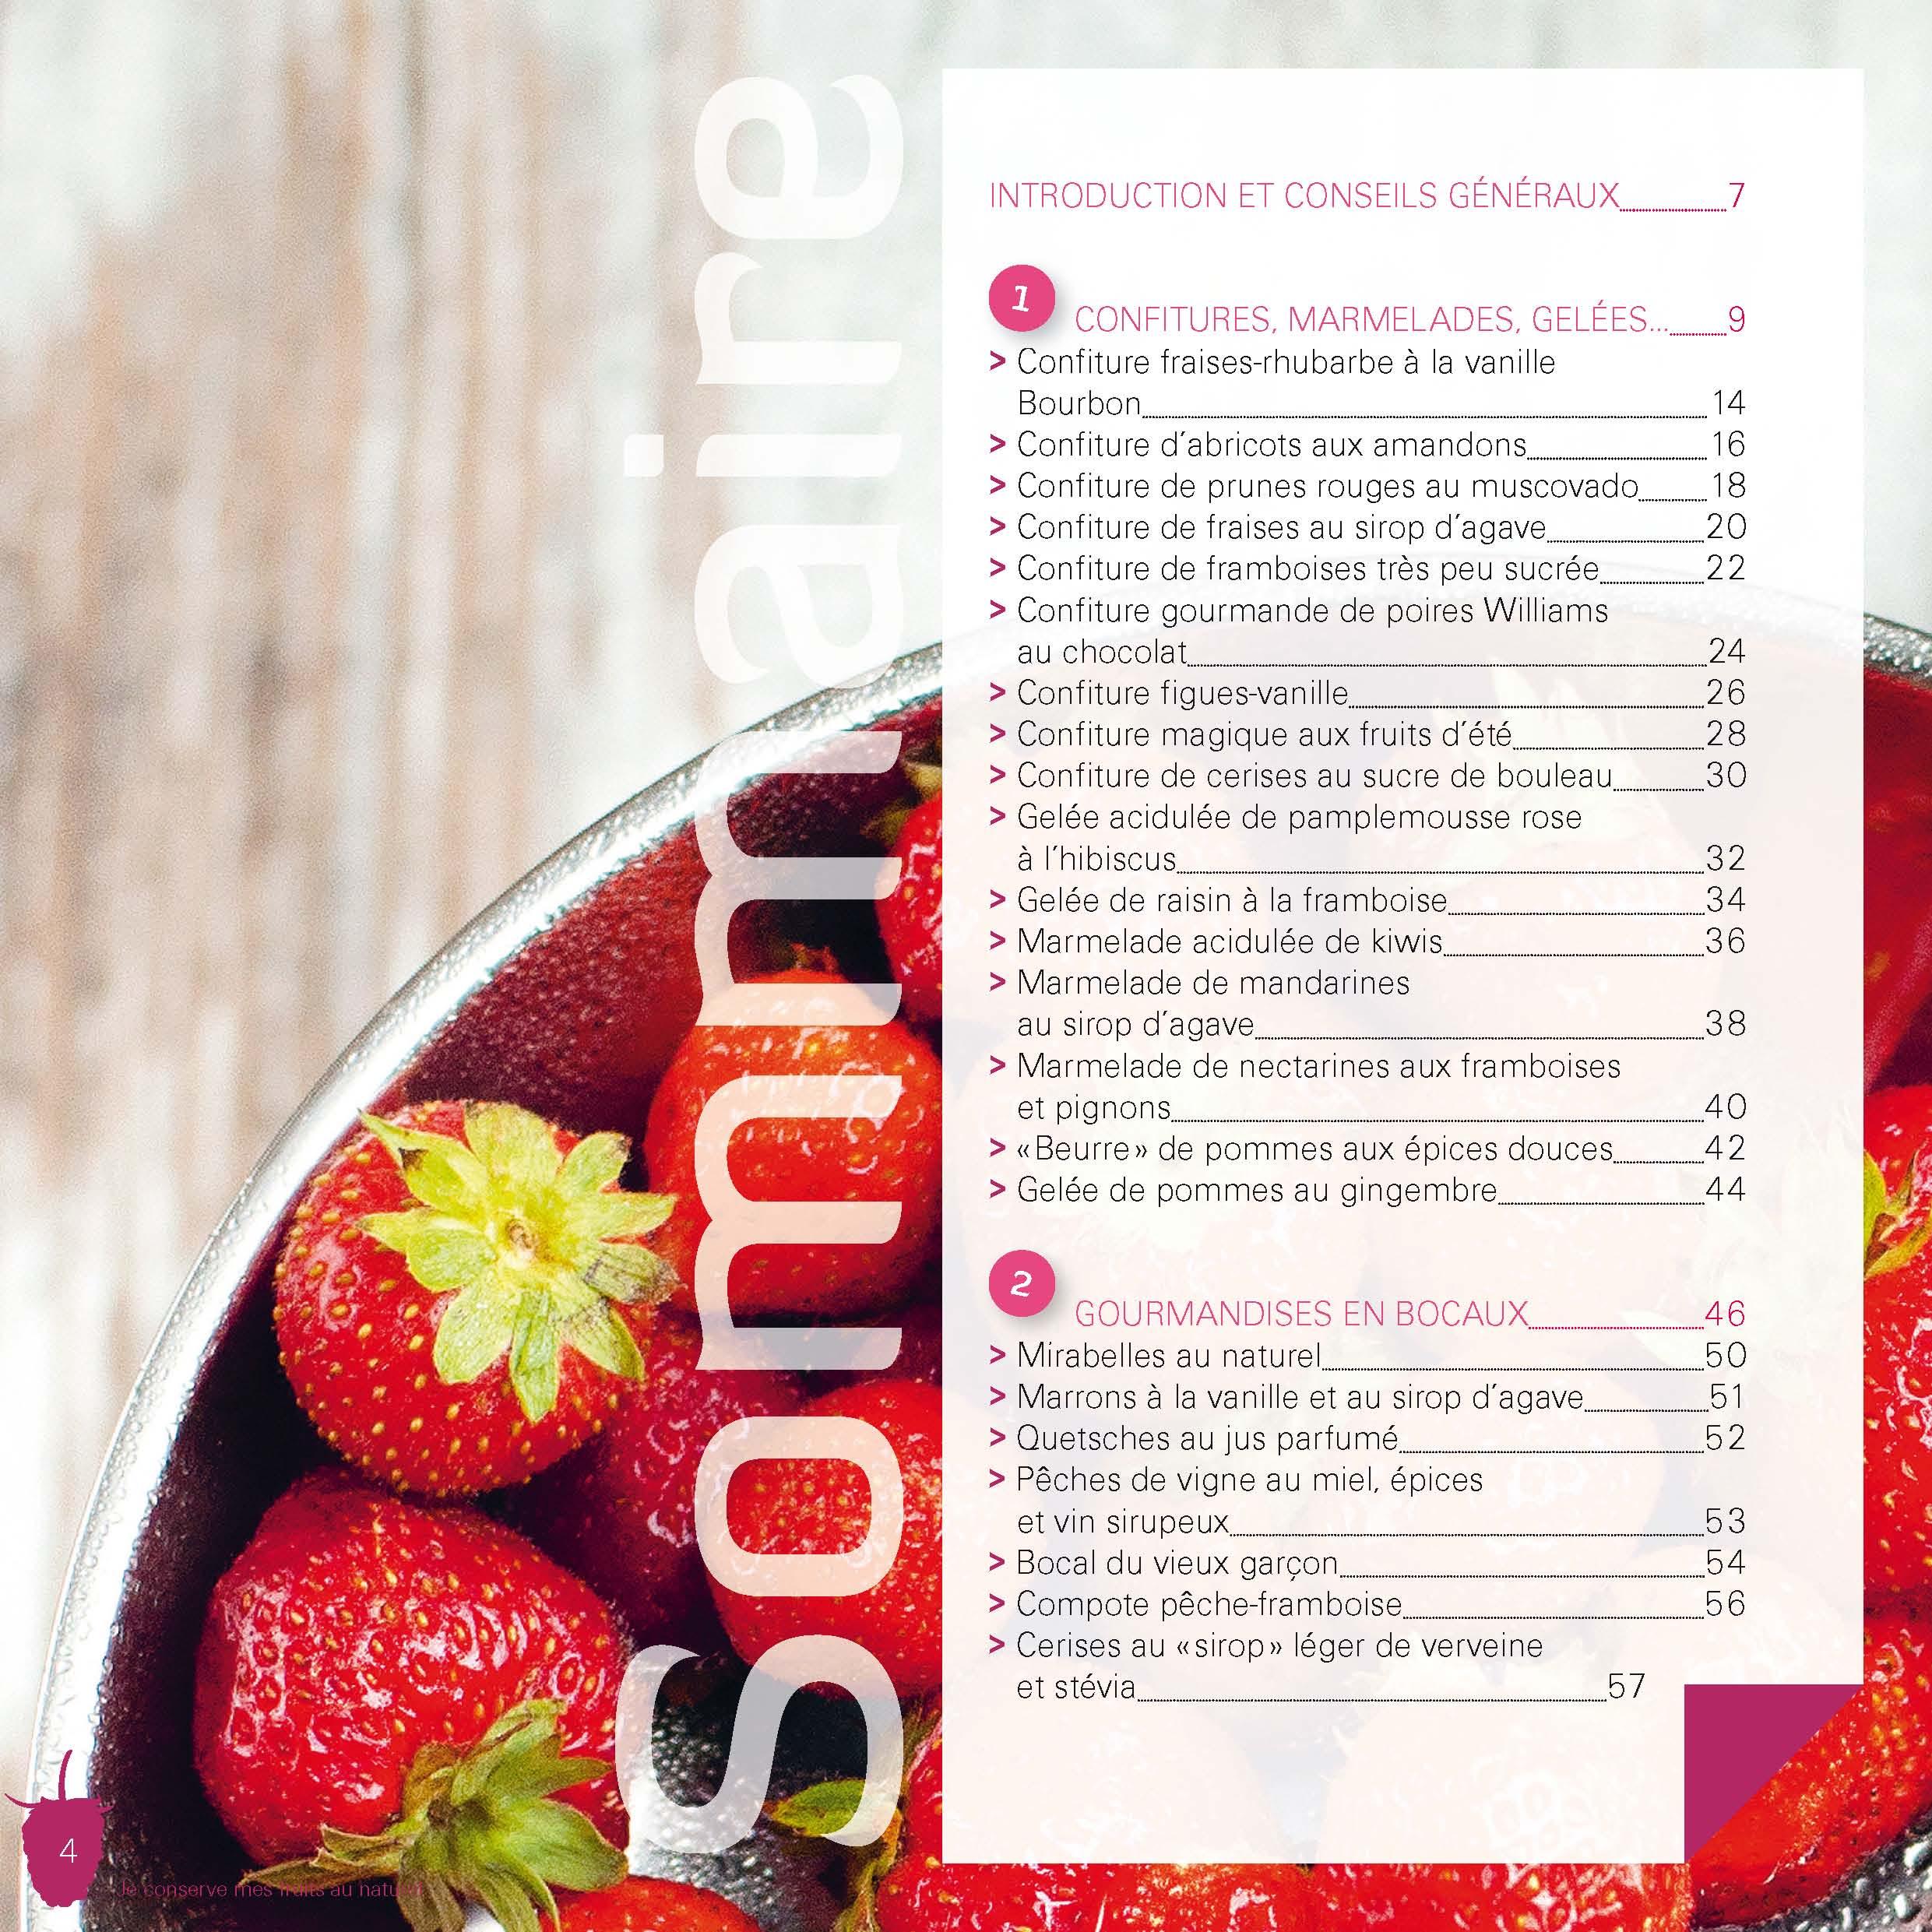 Mes confitures, compotes, fruits séchés, sirops… 2